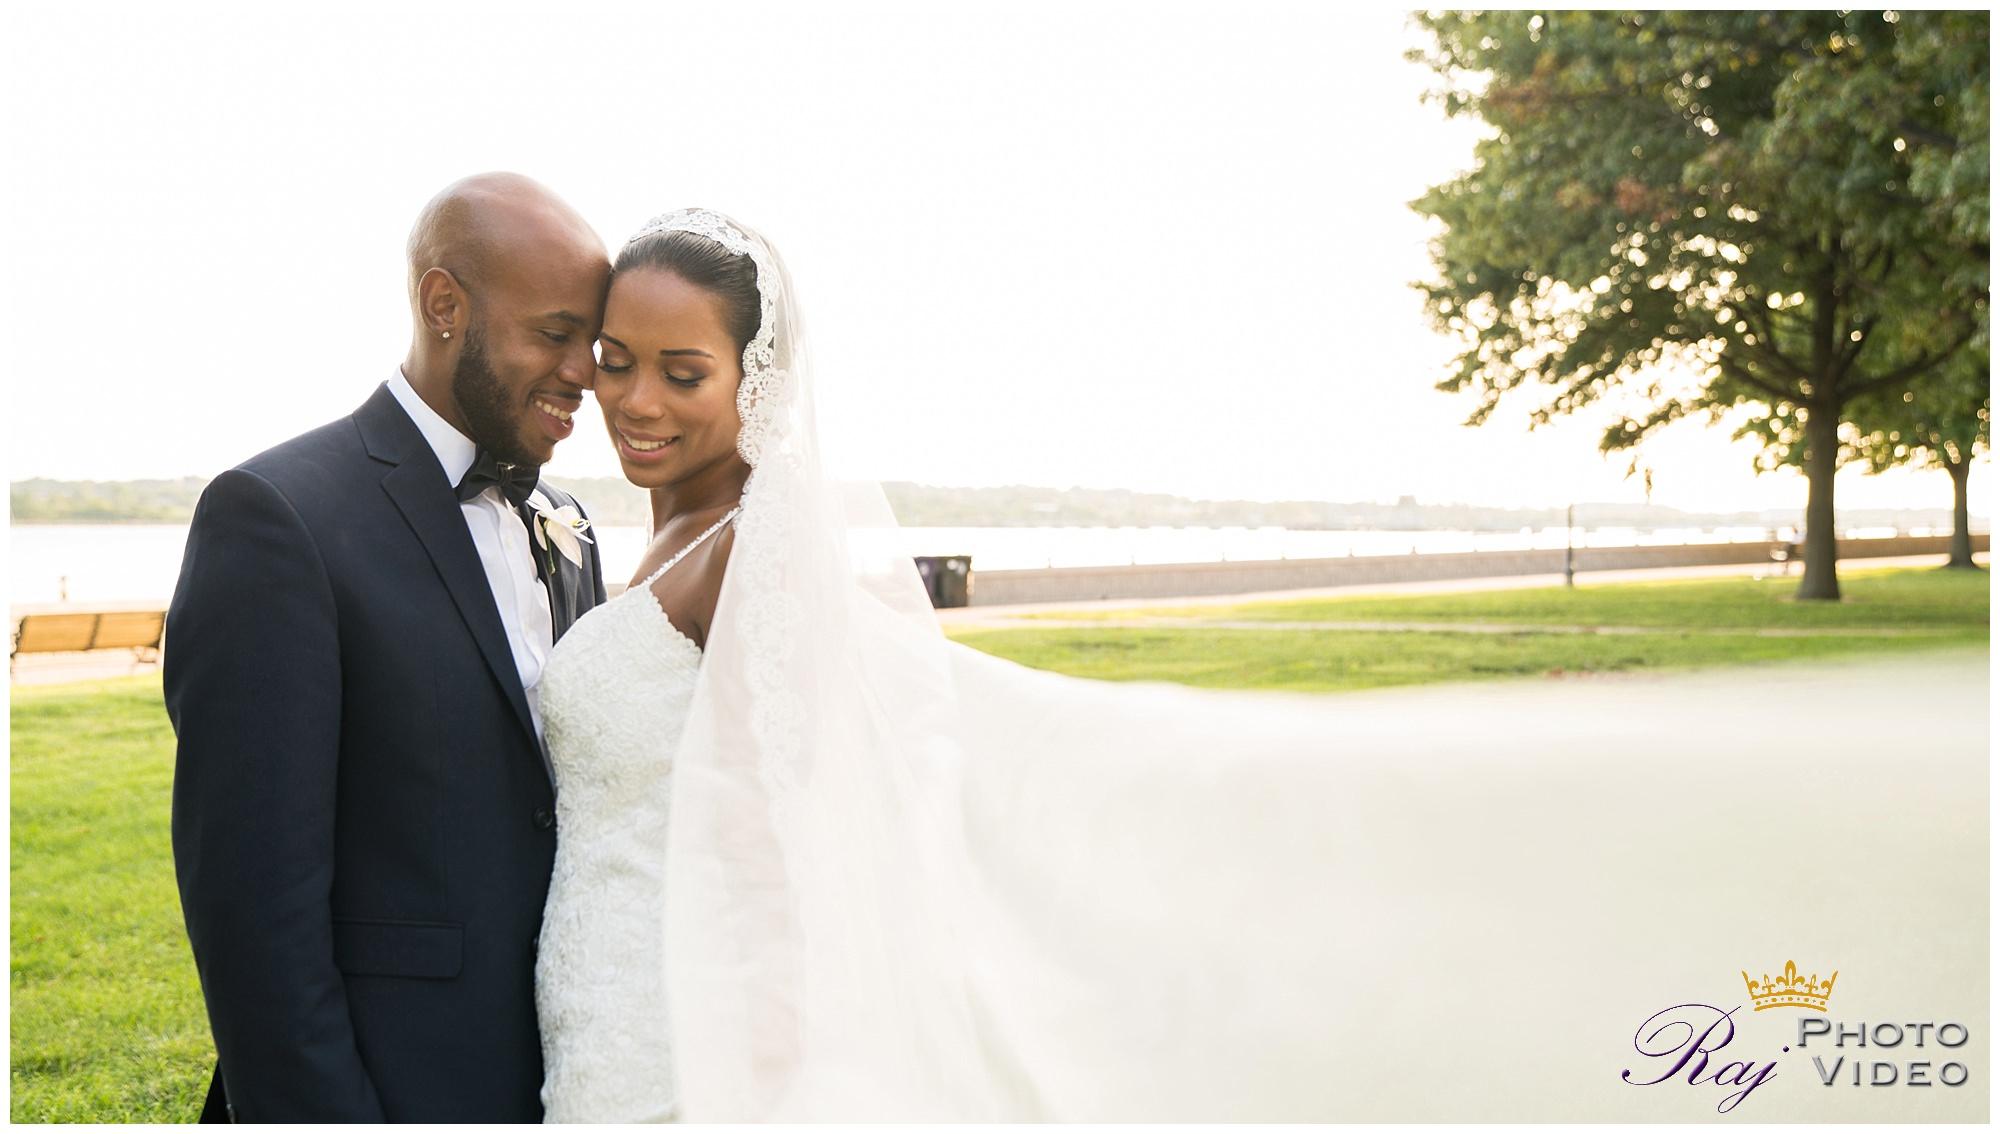 The-Armory-Perth-Amboy-NJ-Catholic-Wedding-Yudelkis-Stephen-12.jpg